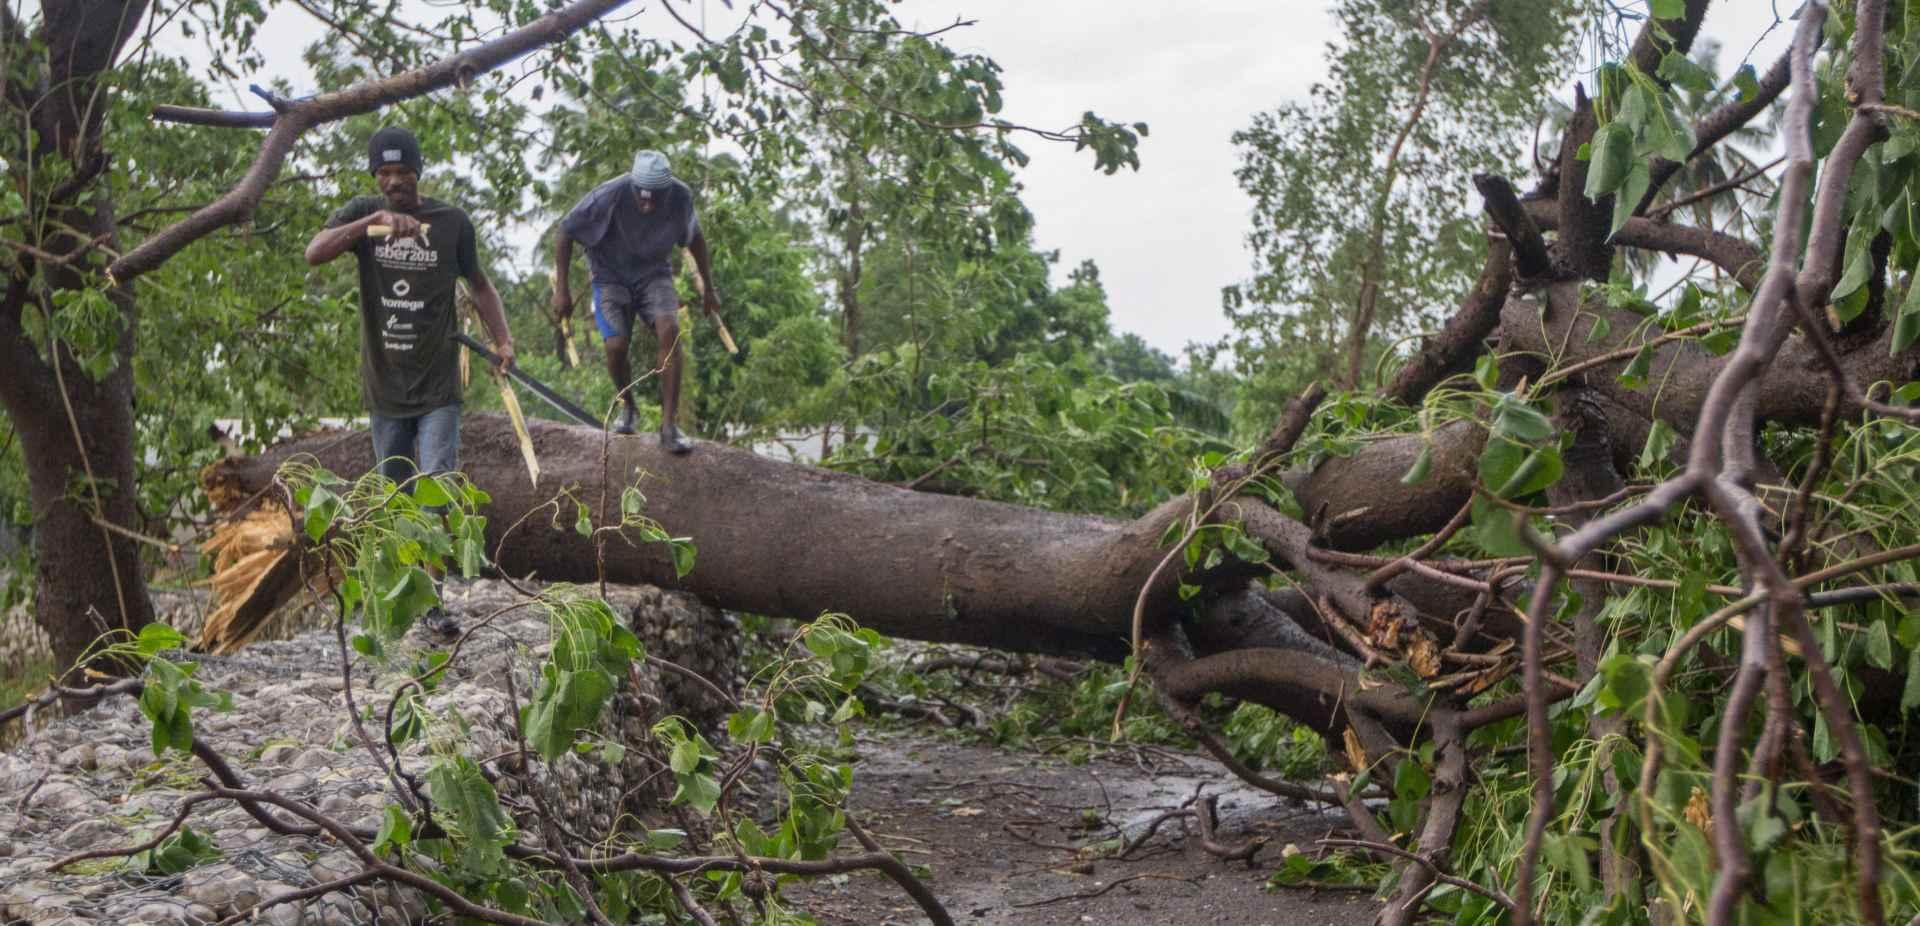 Zbog uragana Matthewa na Floridi evakuirano 1,5 milijuna ljudi